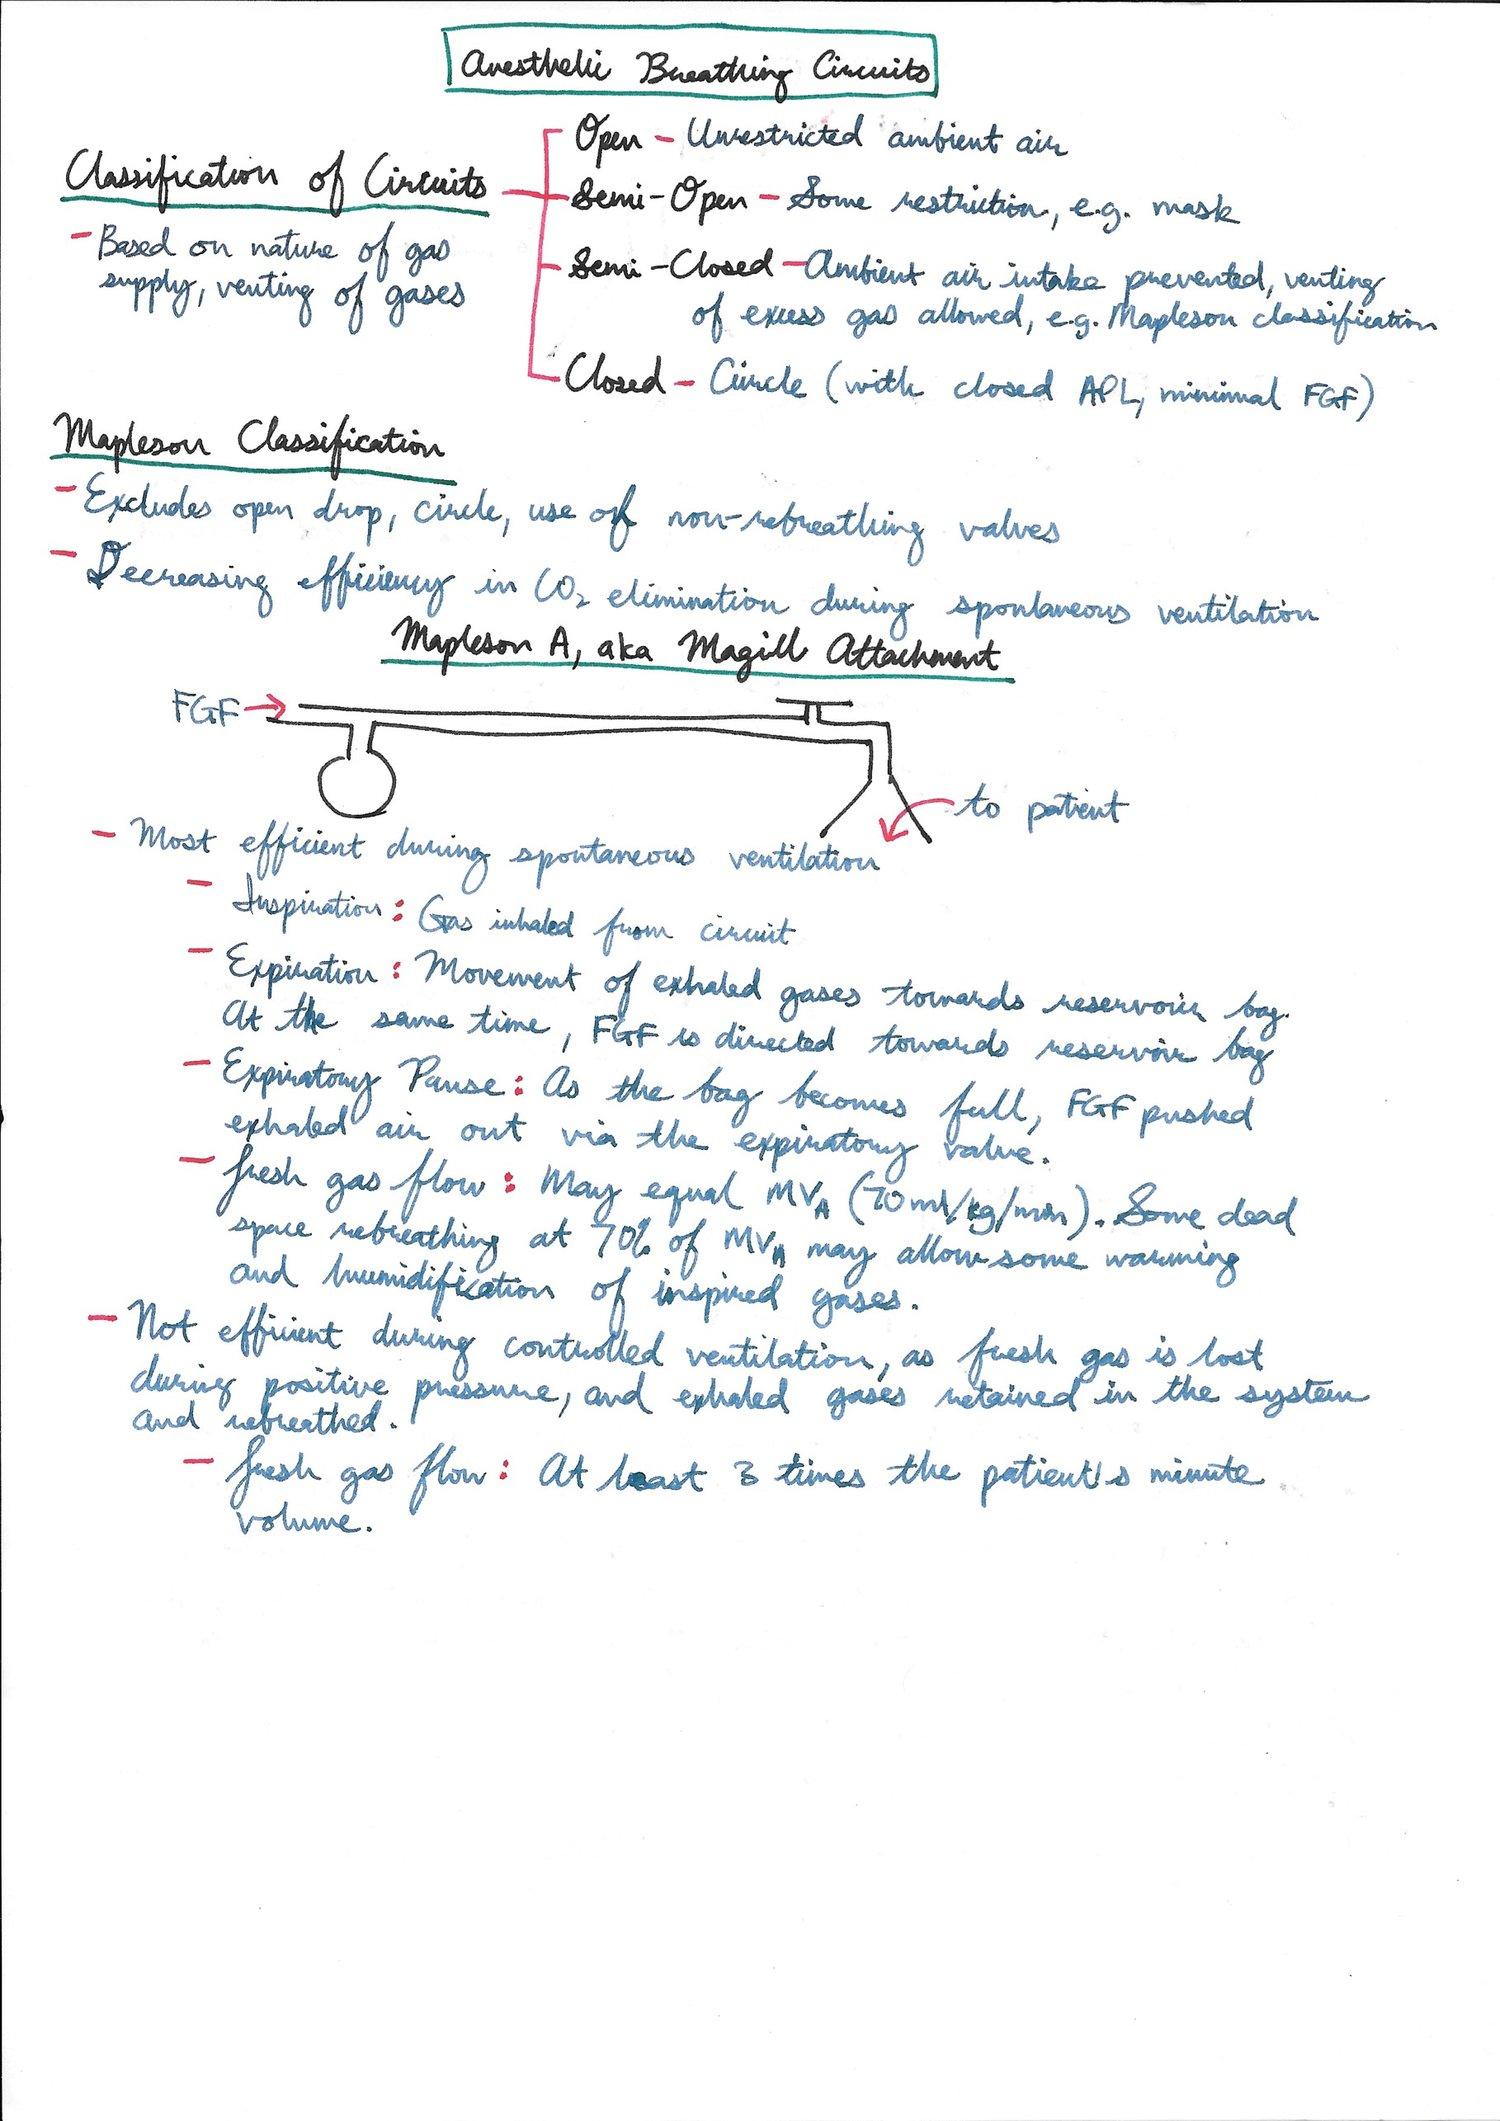 Circuito Vascular : Pulmonology ent airway u2014 anakayubs notes